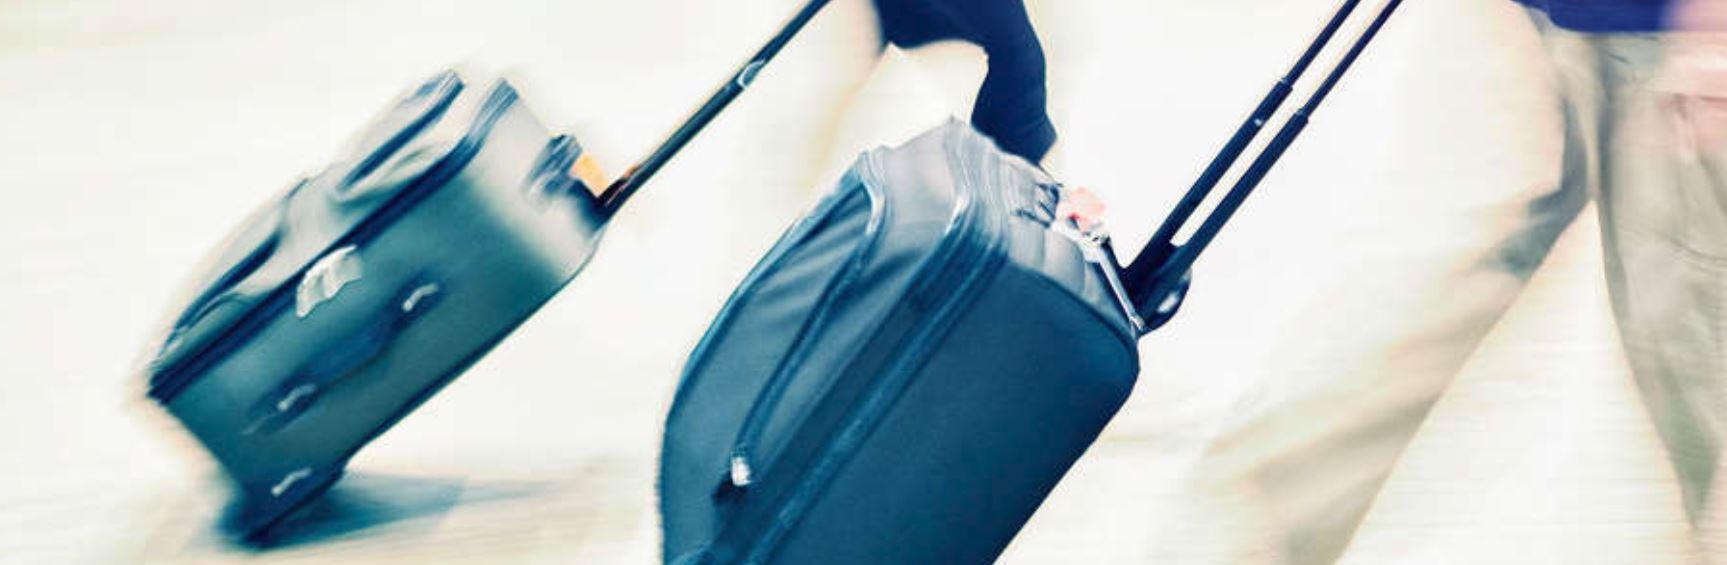 Qantas announces more flexible cabin baggage allowance